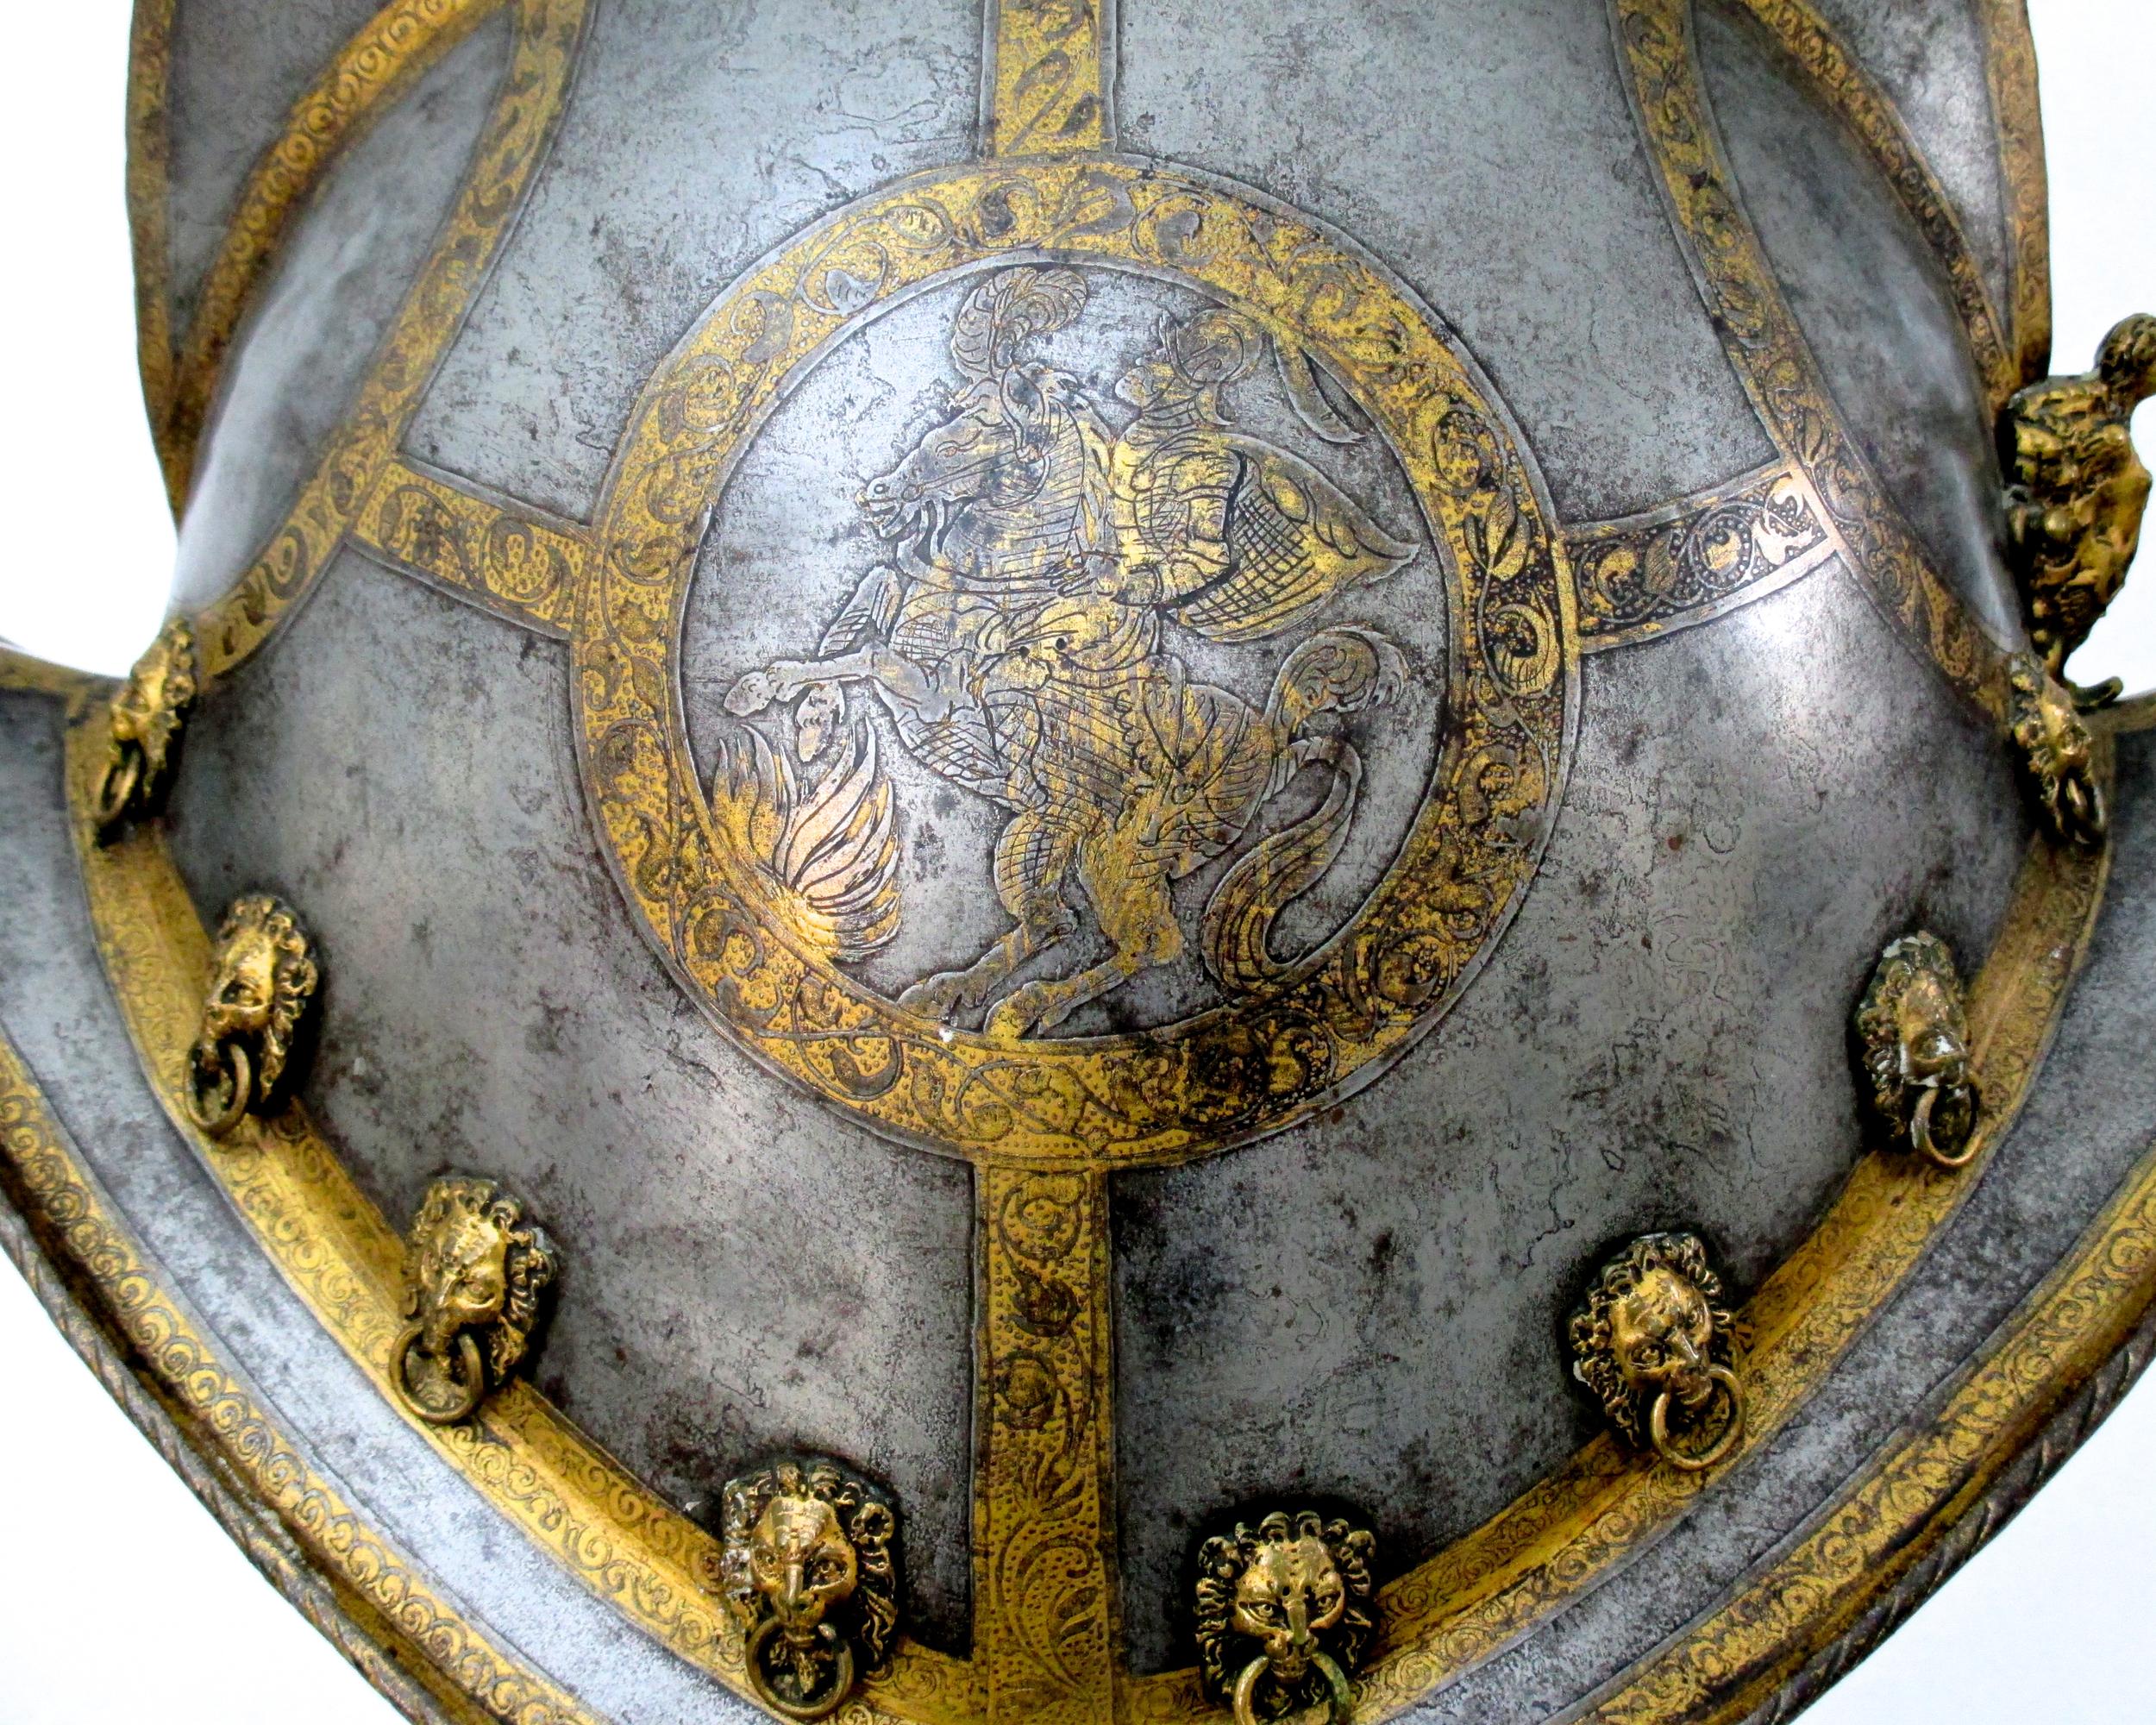 saxon-electoral-guard-comb-morion-late16th-century-helmet-nuremburg-german-gary-friedland-arms-armor3.jpg